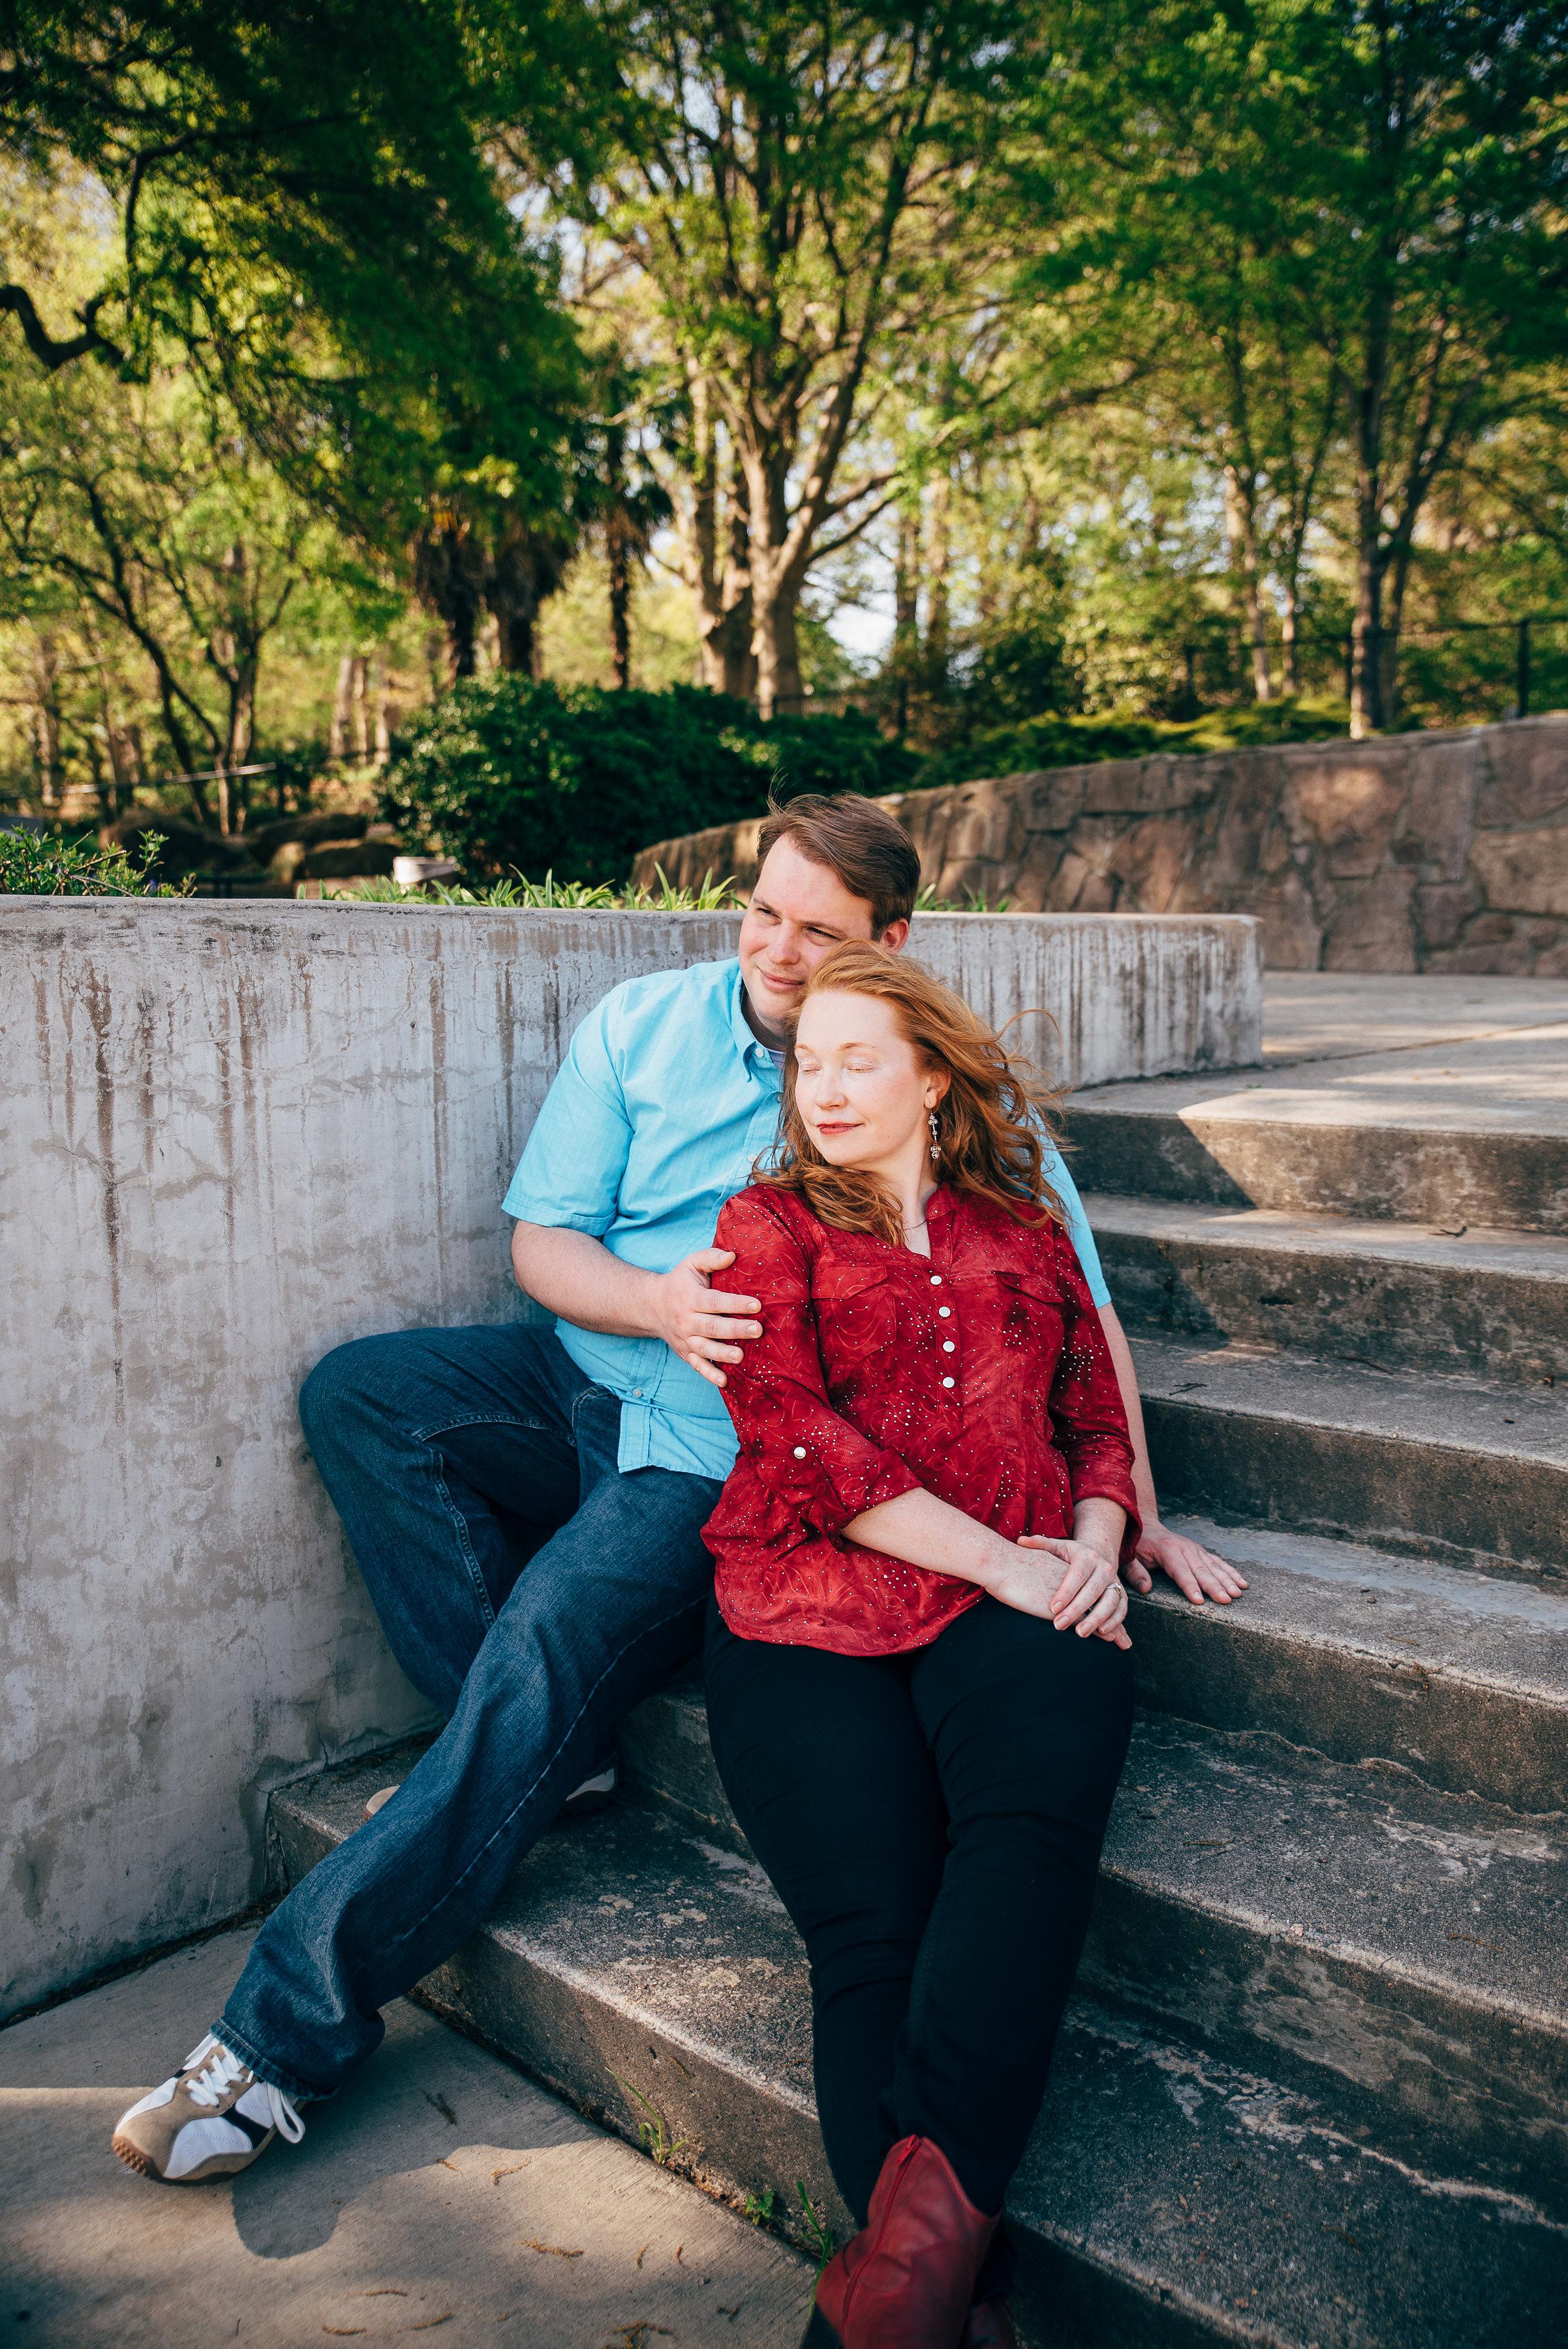 Pullen Park - Raleigh Wedding Photographer - North Carolina Wedding Photographer